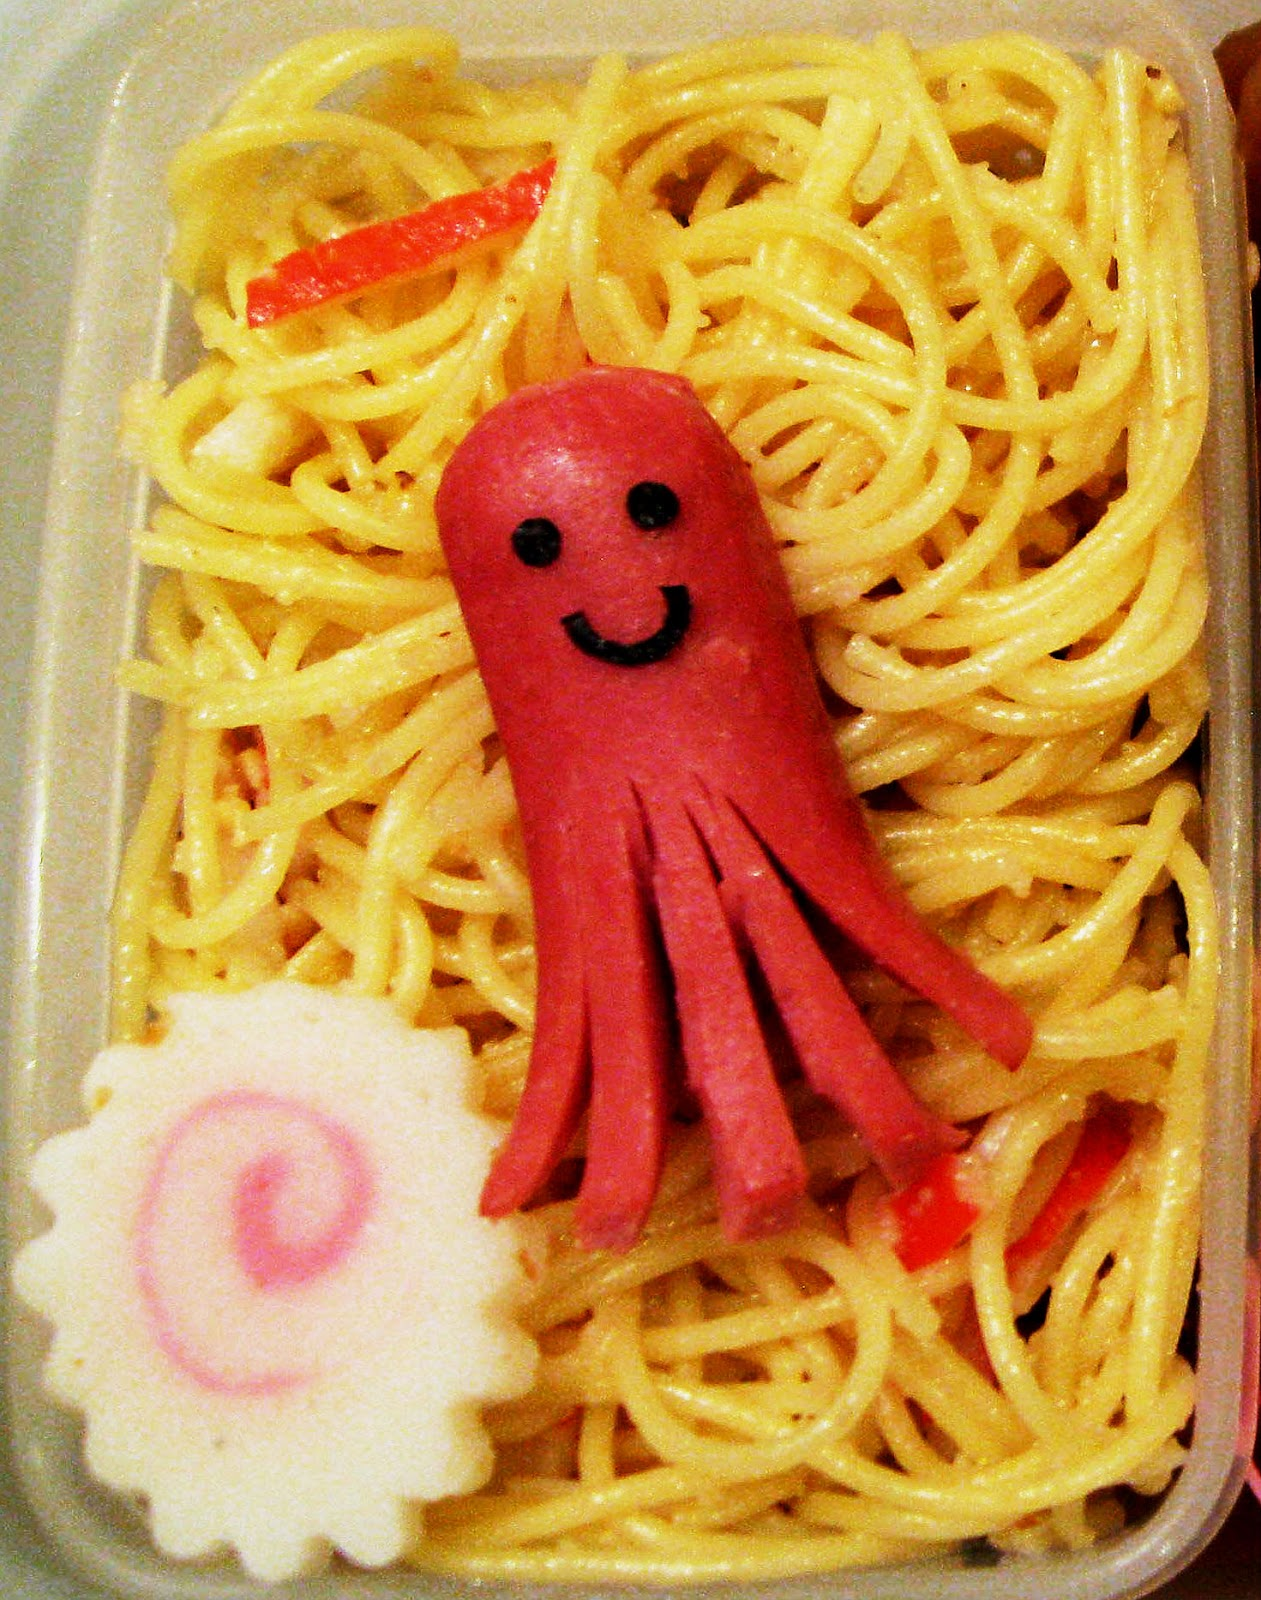 Hot Dog Octopus Maker